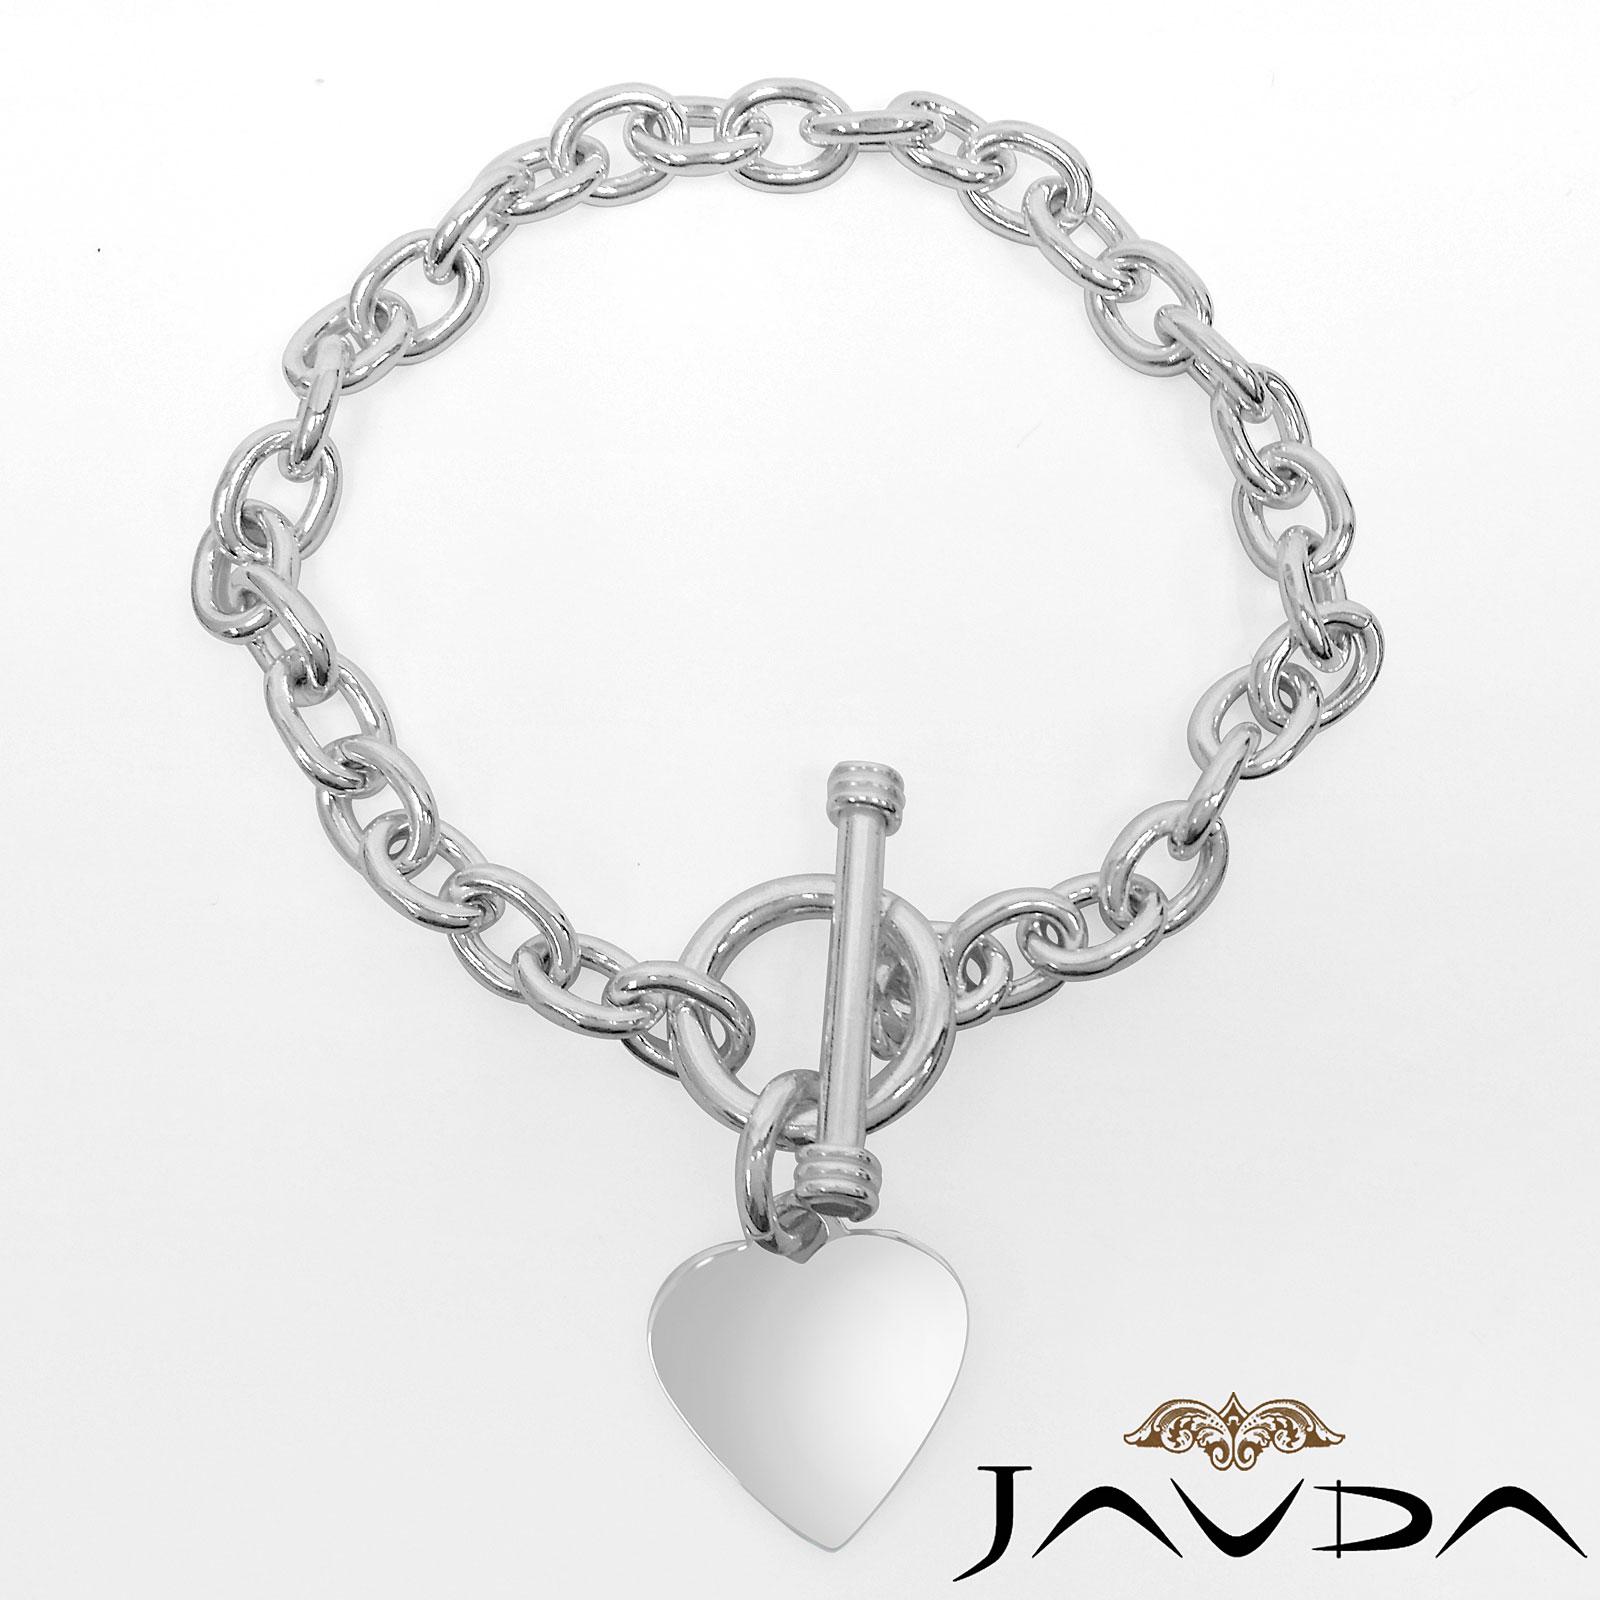 Silver Chain Link Bracelet: Heart Rolo Chain Link 925 Sterling Silver Gorgeous Women's